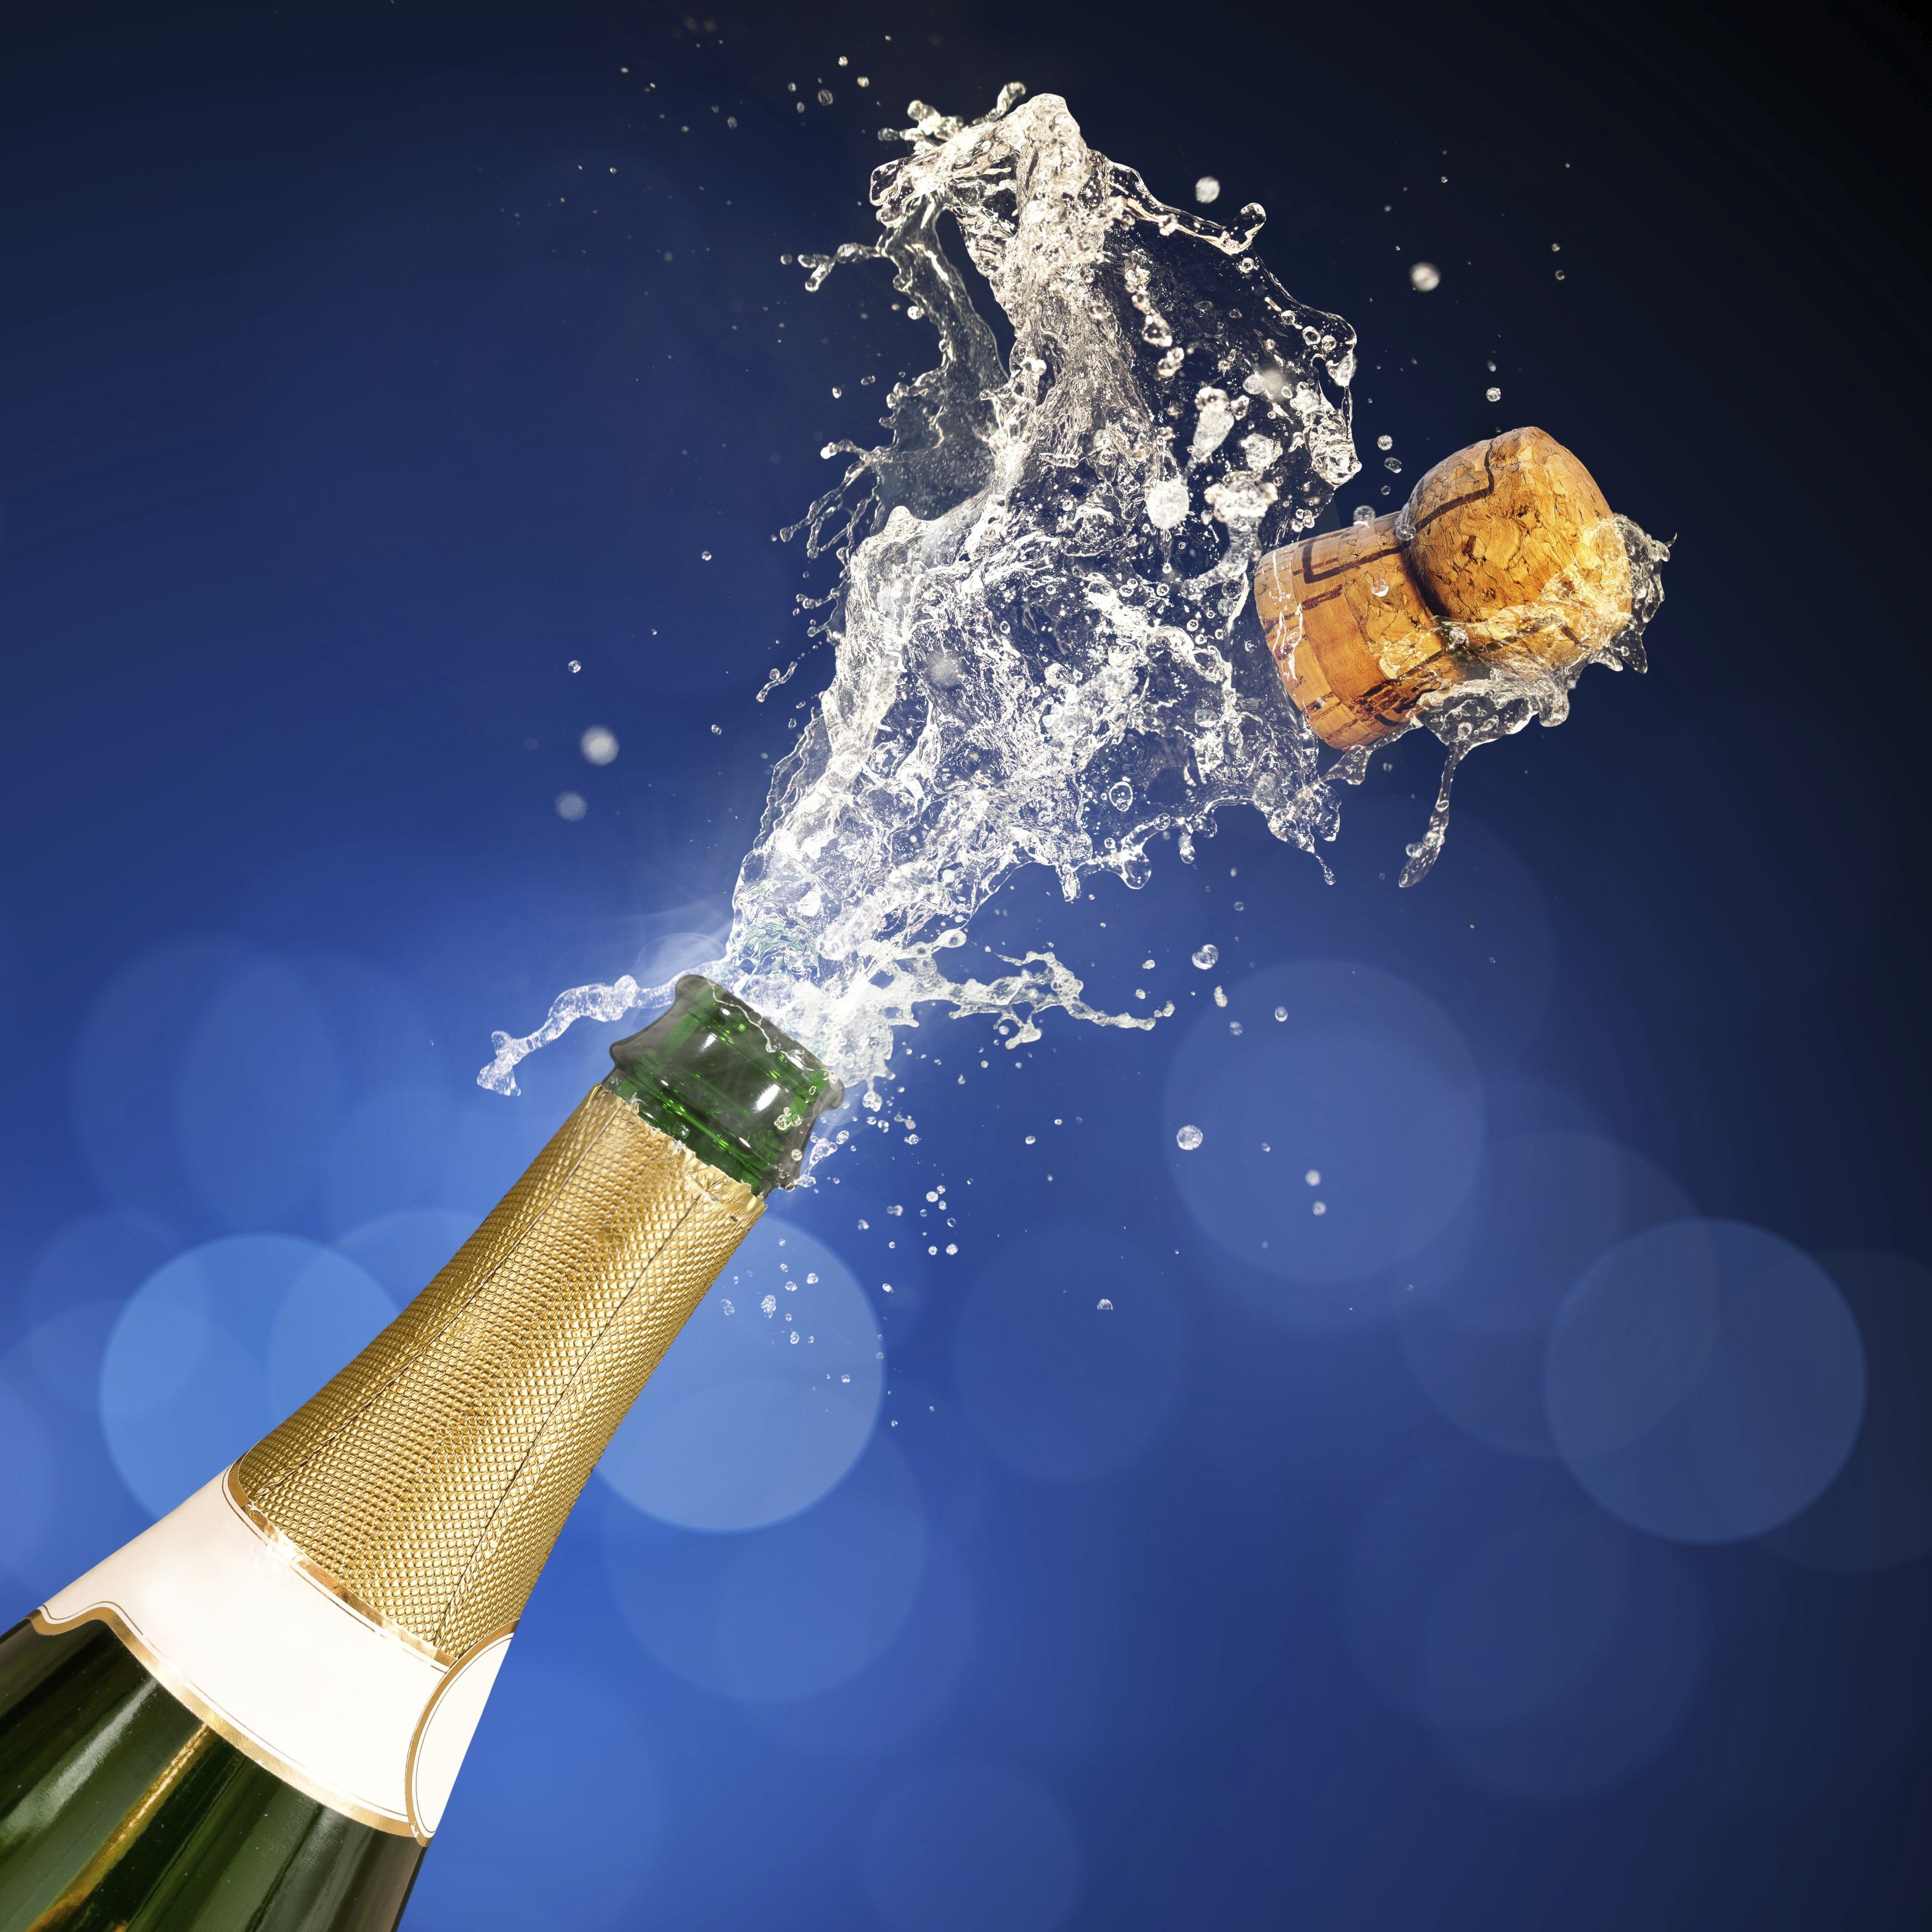 manifest a reason to celebrate